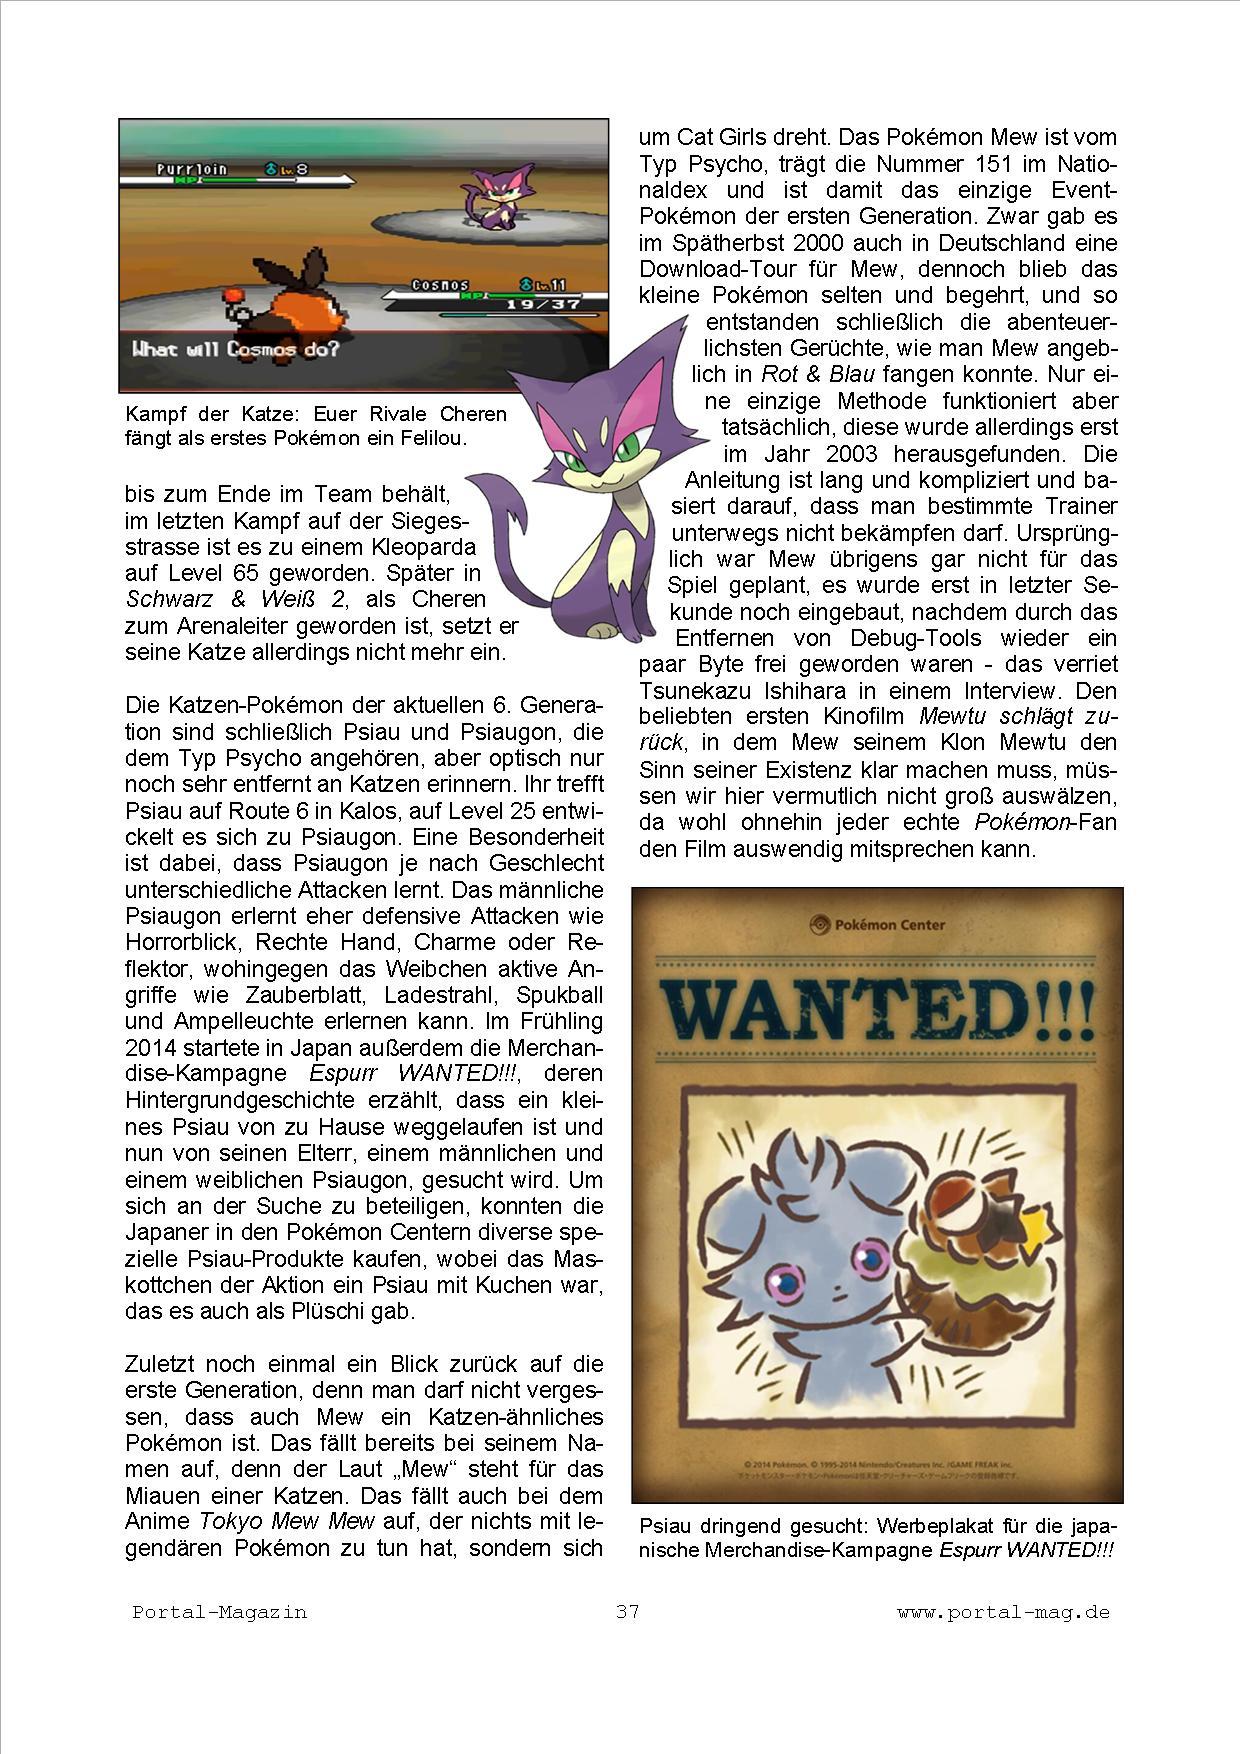 Portal Magazin